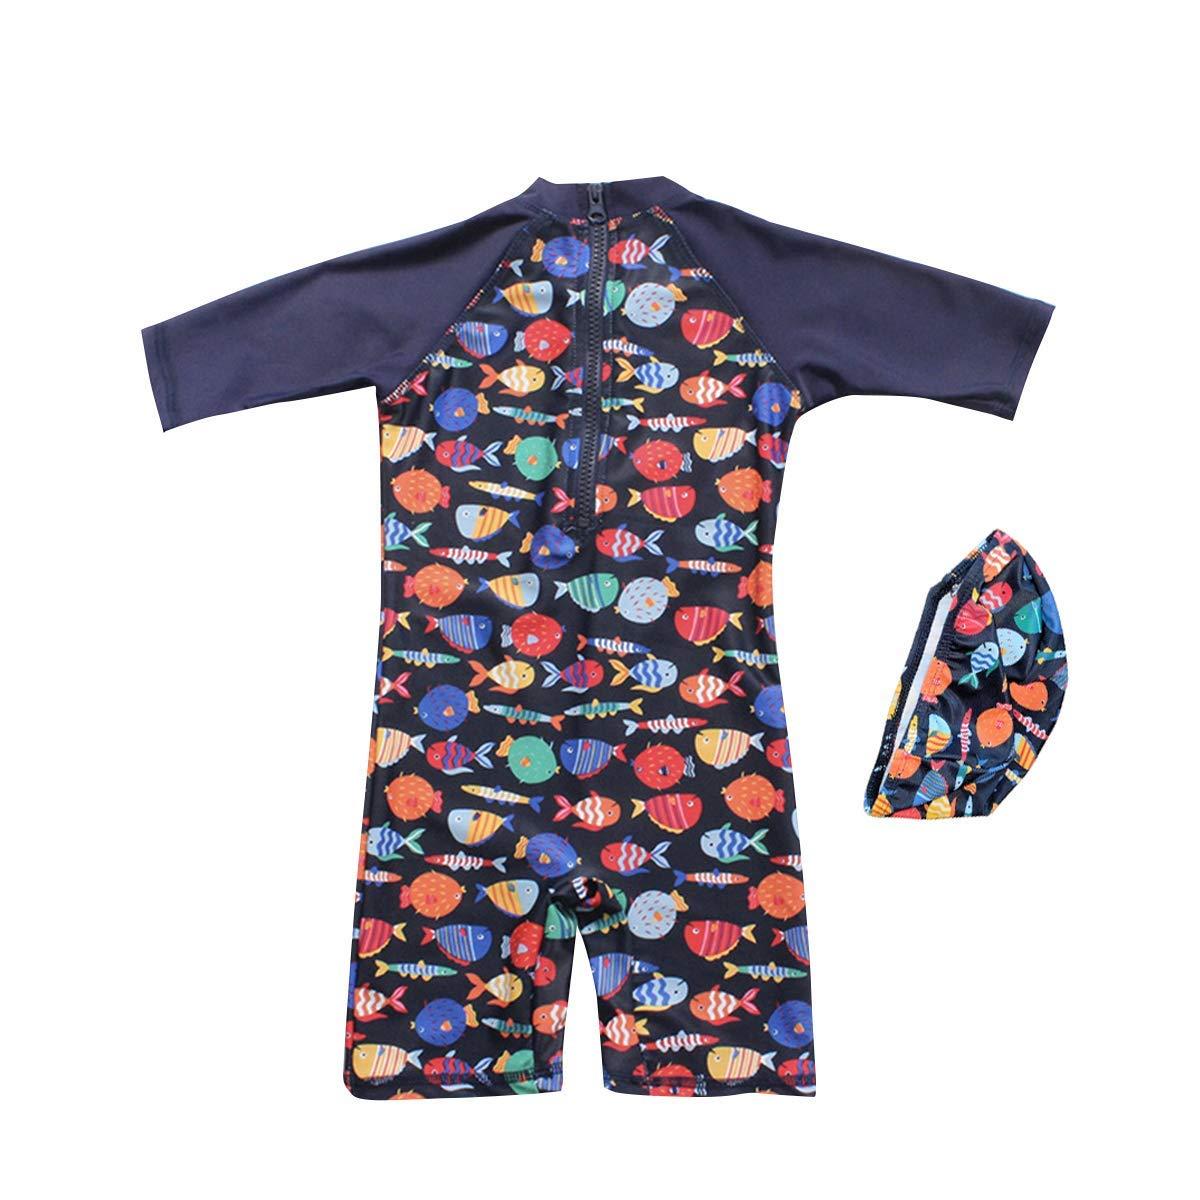 Megartico Boys/' Swimsuit One Piece Rash Guard Kids Long Sleeve Sunsuit Swimwear Sets Toddler Beach Sport Surf